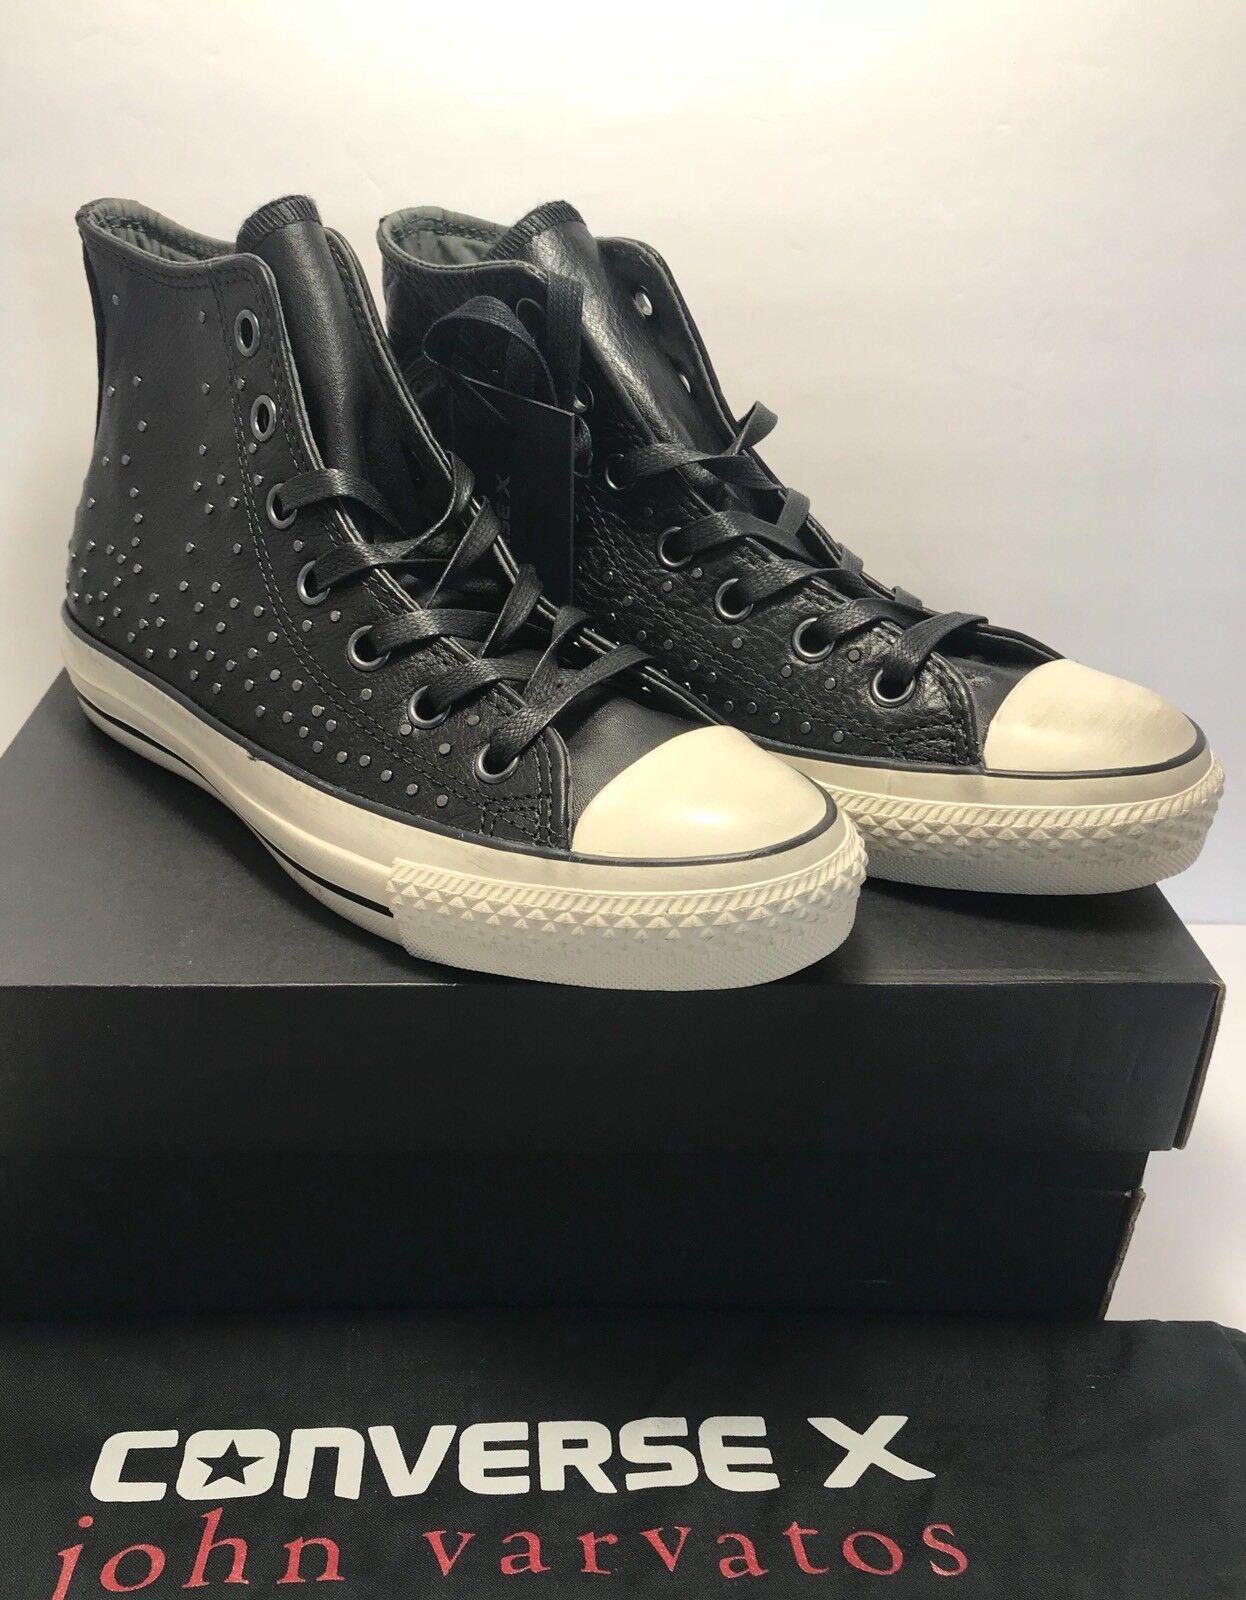 250 Converse Mens Size 12 John Varvatos CTAS Mini Stud Black Leather Shoes